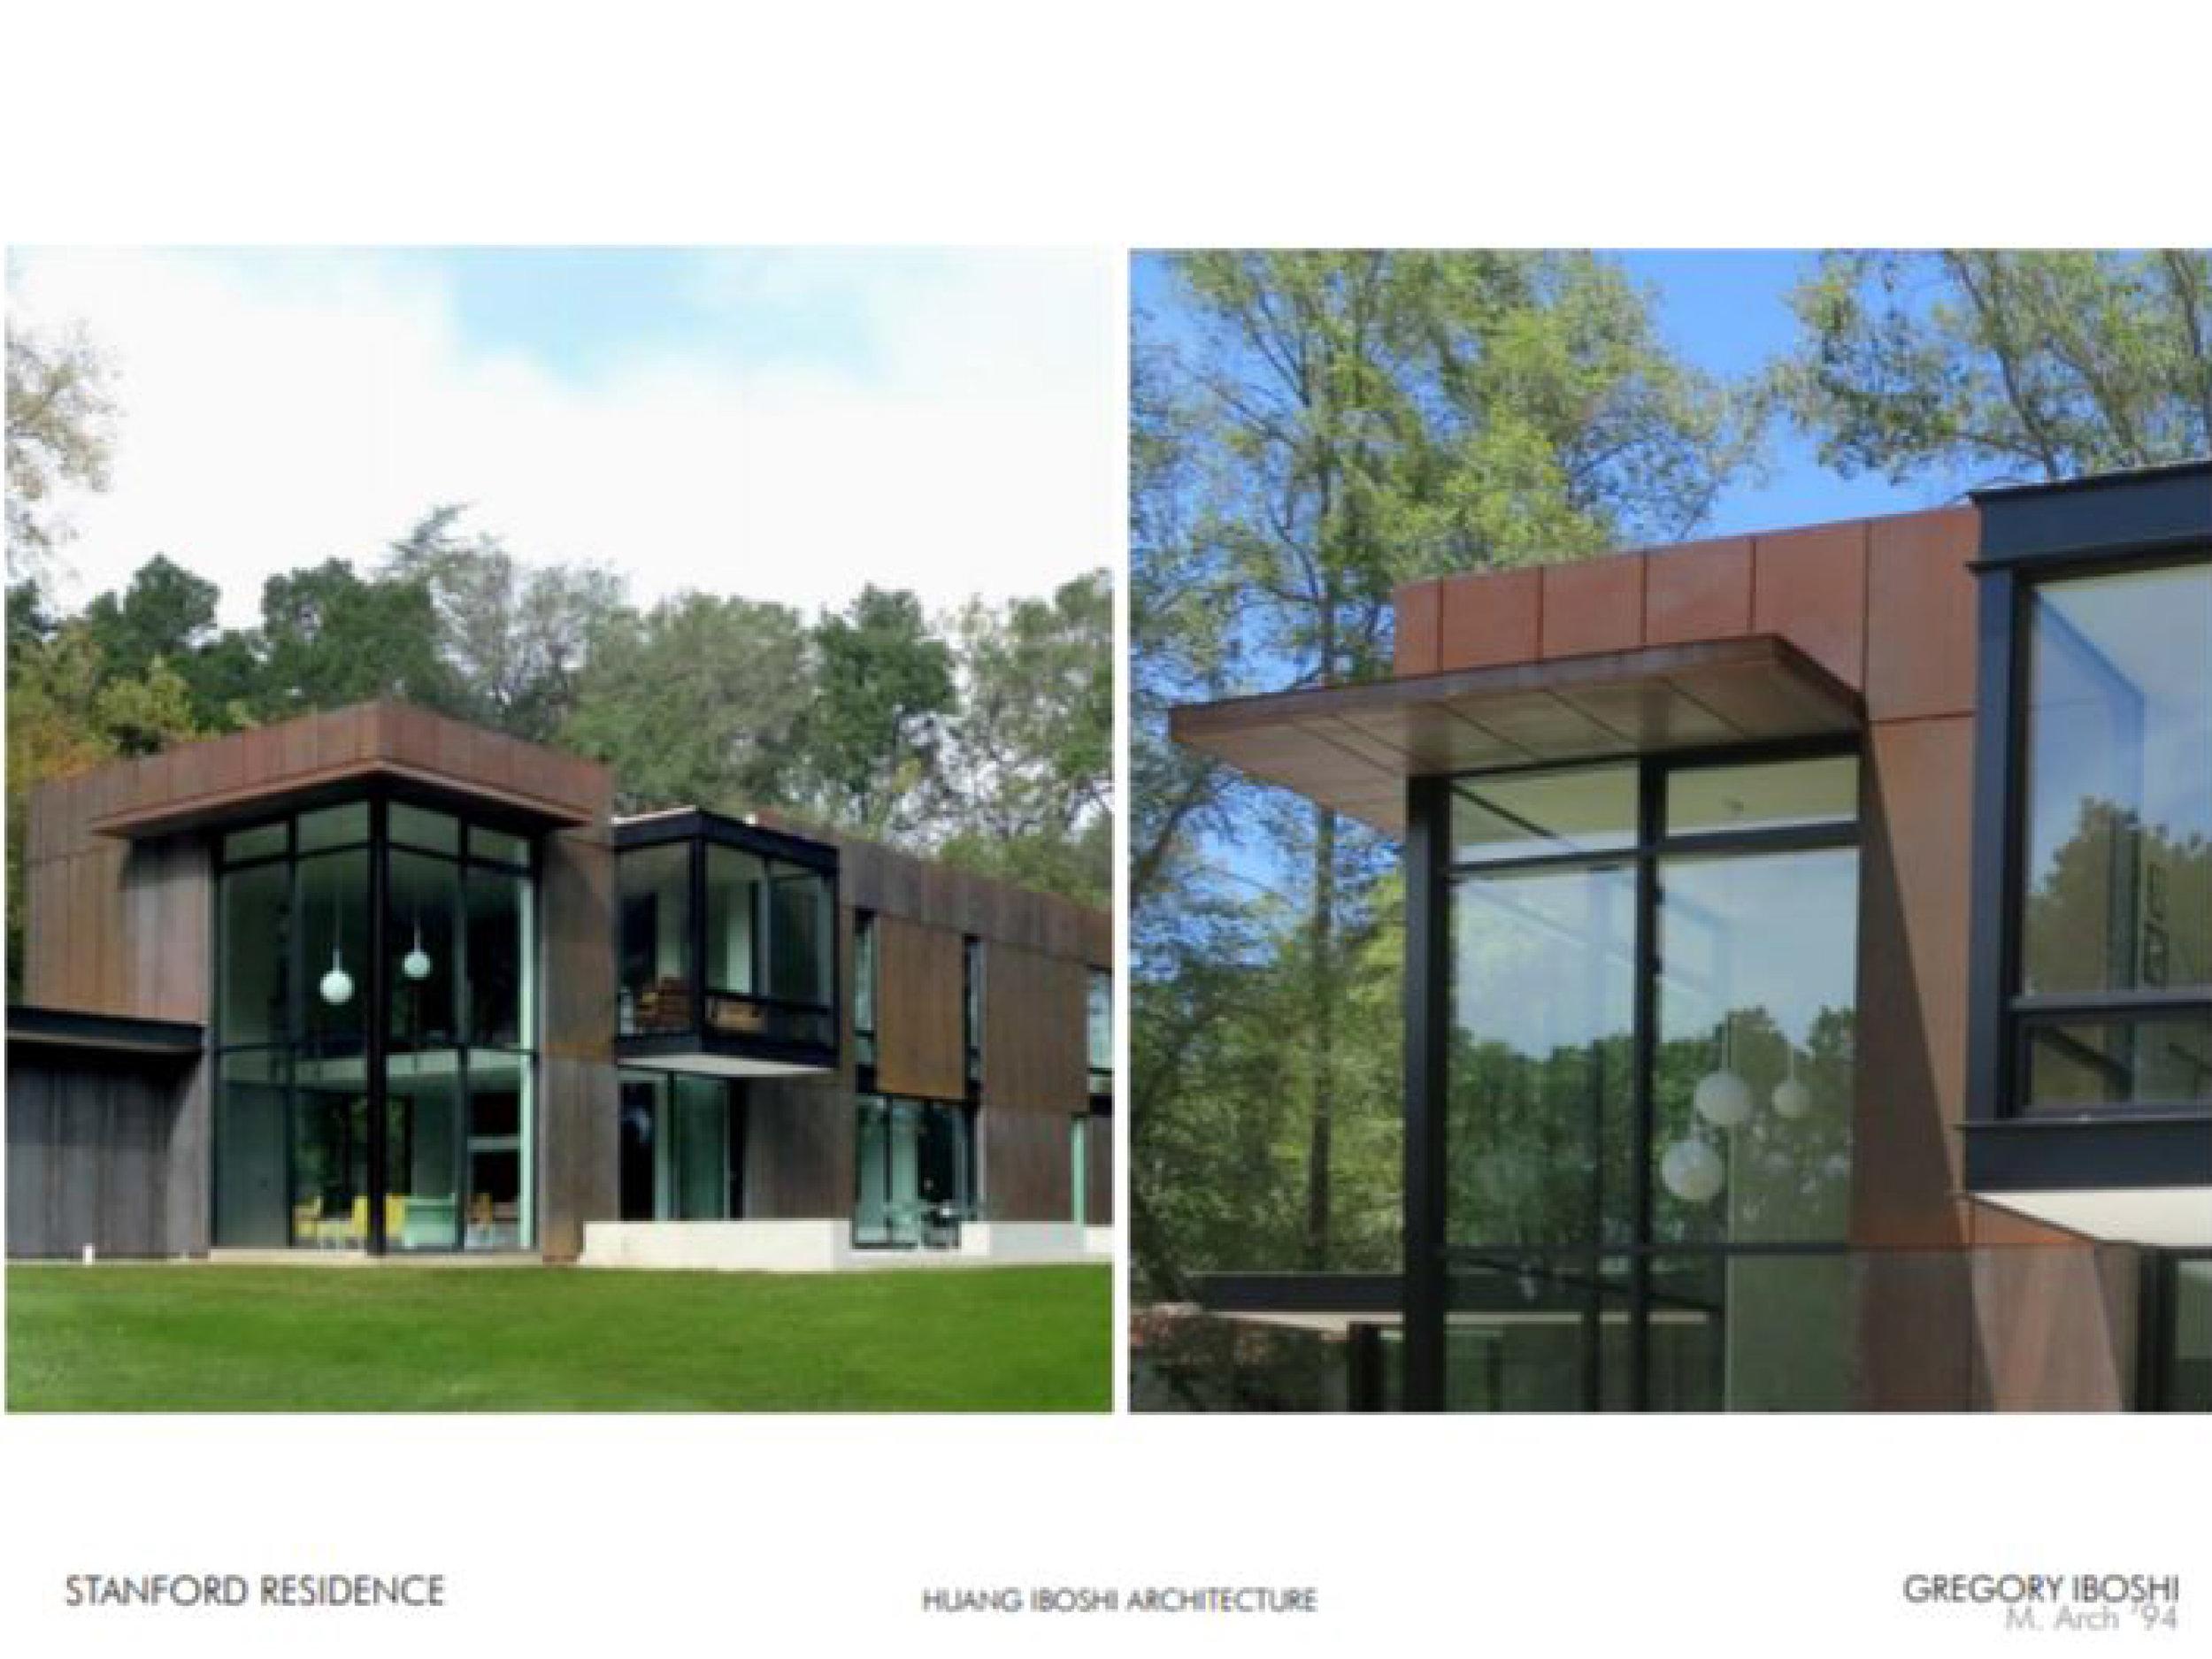 MIT ARCHITECTURE 150 SAN FRANCISCO SLIDESHOW-89 copy.jpg